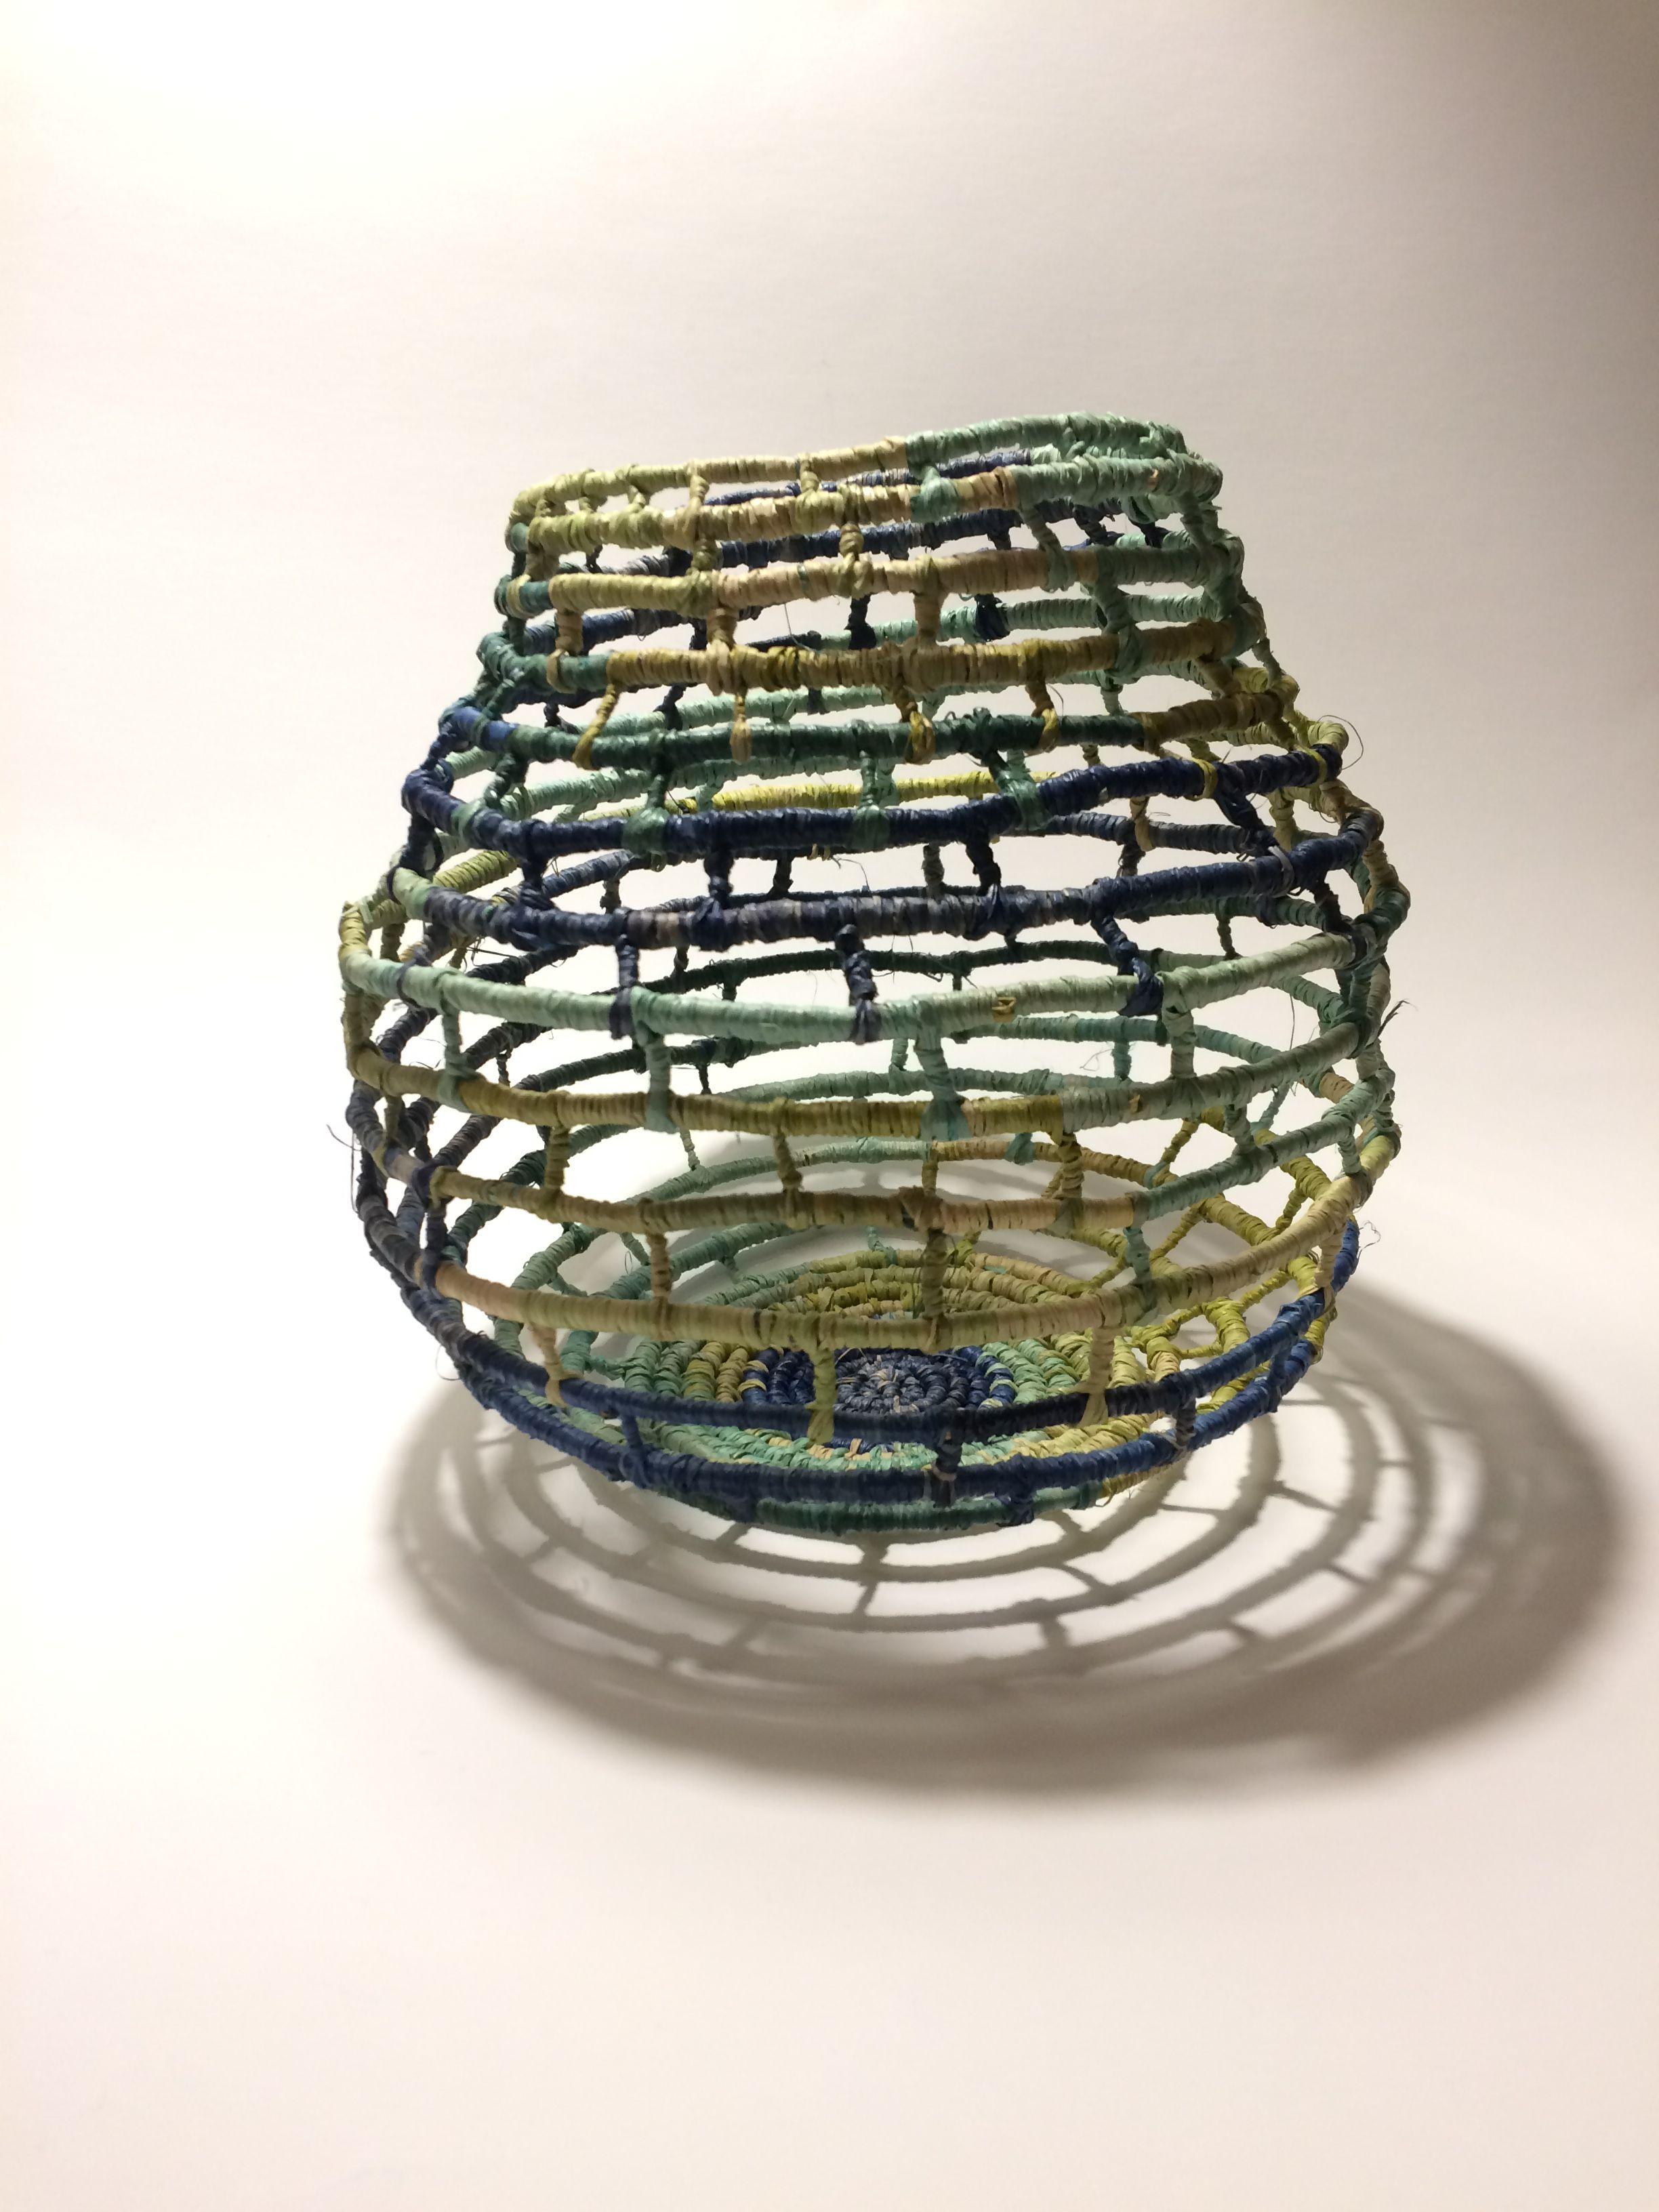 Corey Bishop Coiled Raffia Basket Contemporary Baskets Coiled Baskets Basket Weaving